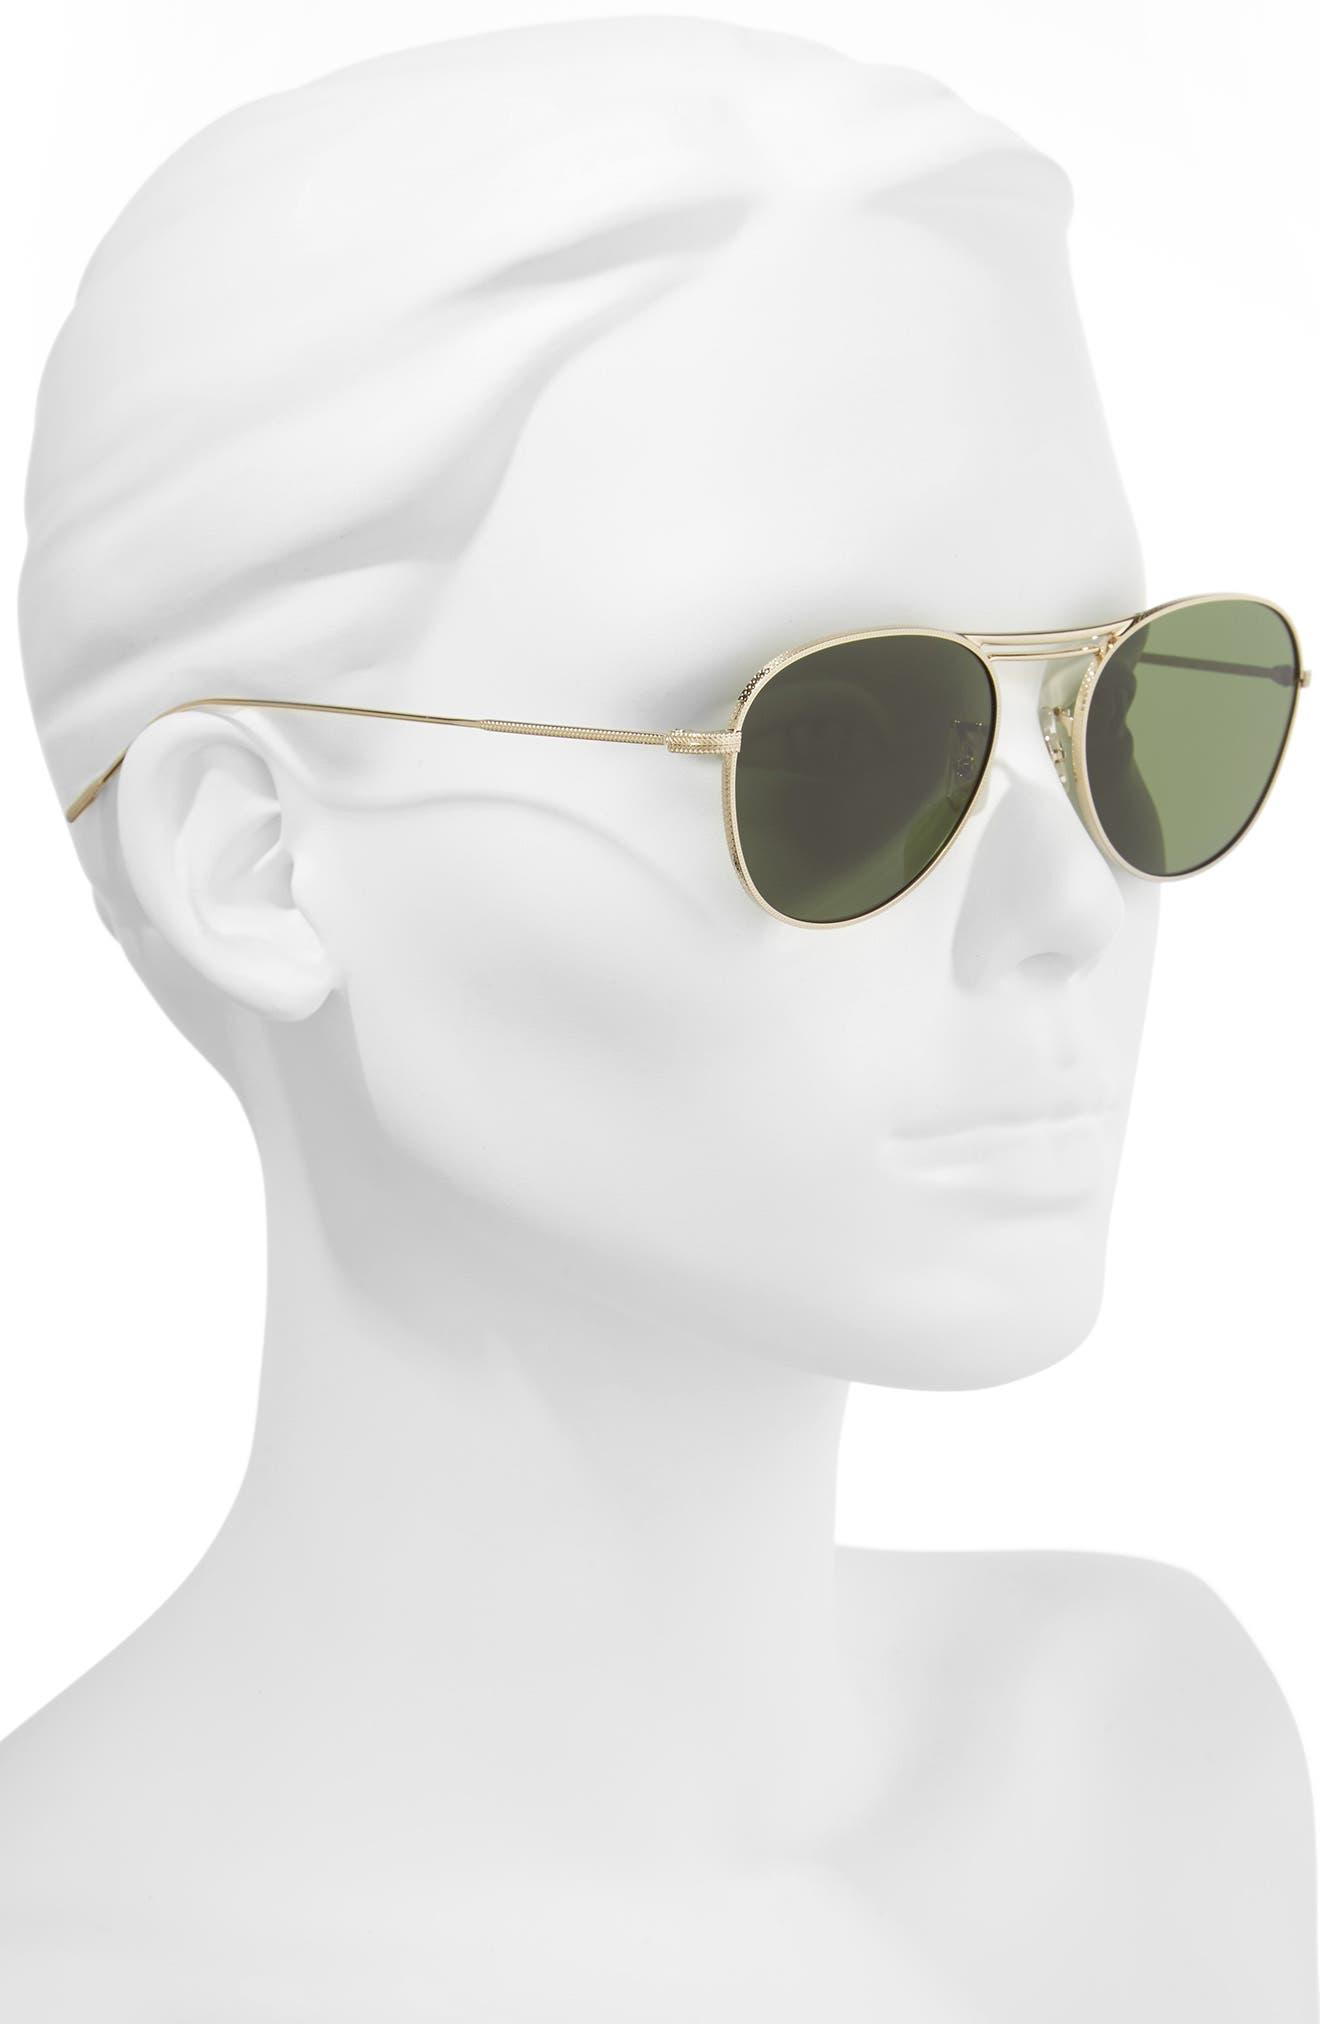 Cade 52mm Mirror Lens Aviator Sunglasses,                             Alternate thumbnail 2, color,                             GOLD/ GREEN